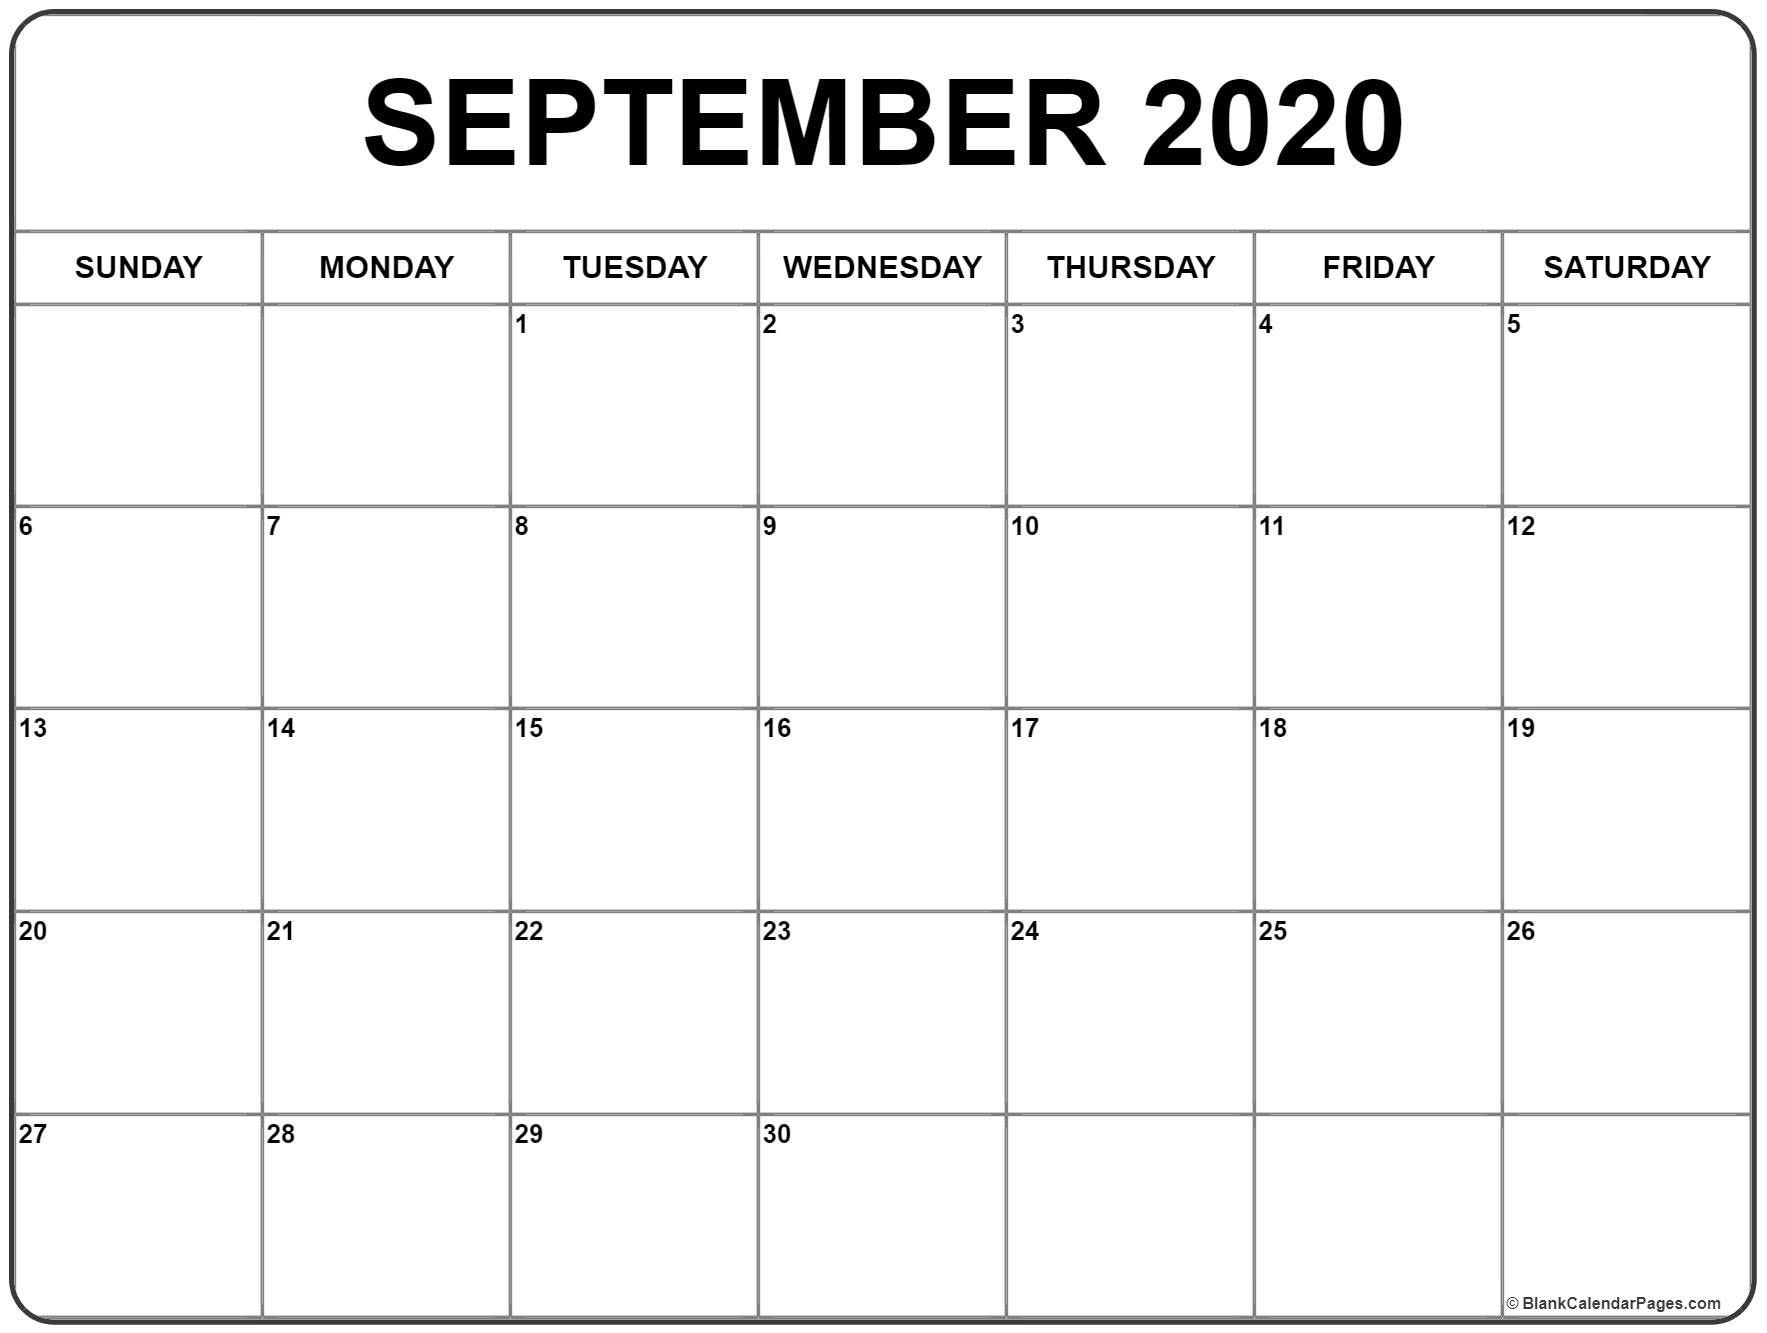 September 2020 Calendar 51 Calendar Templates Of 2020 throughout Calendar September 2020 Start Monday Printable Free